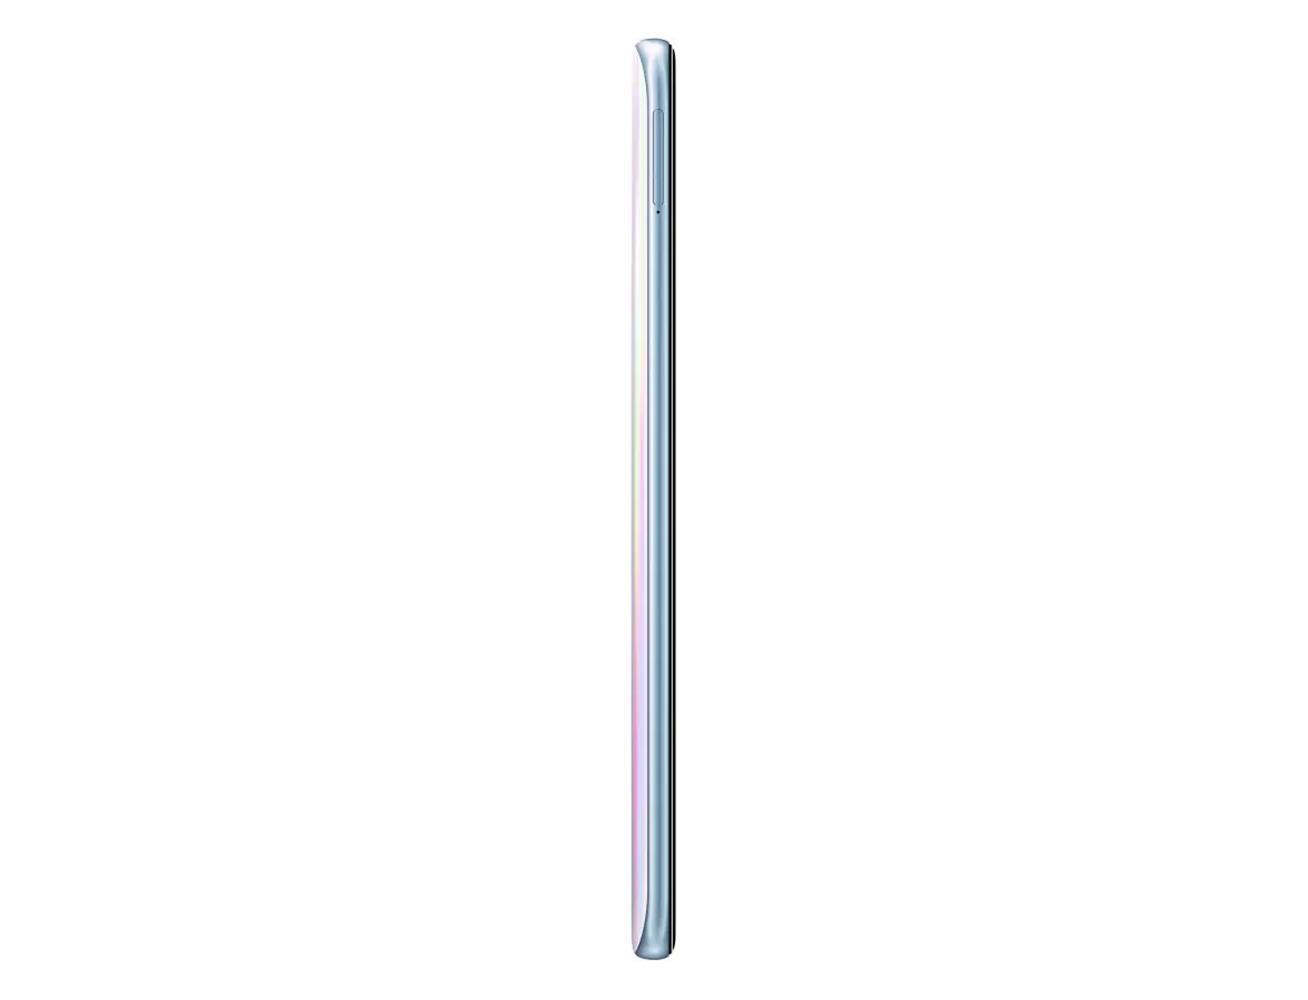 Samsung Galaxy A50 Smart Phone 6 4